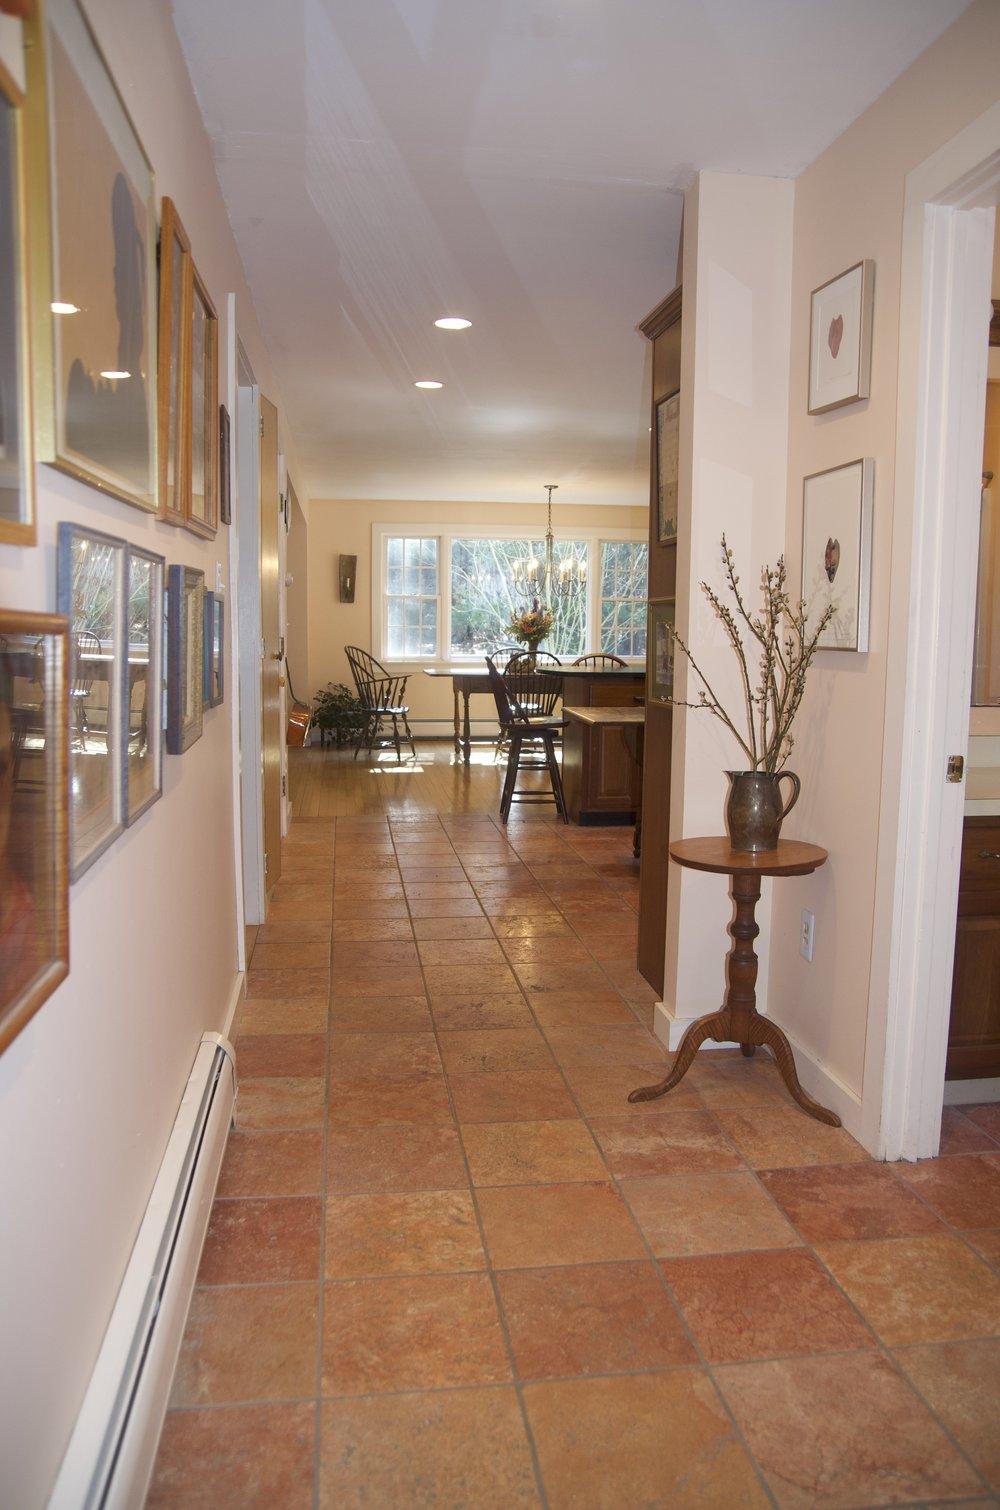 CPDS amherst hallway.jpg